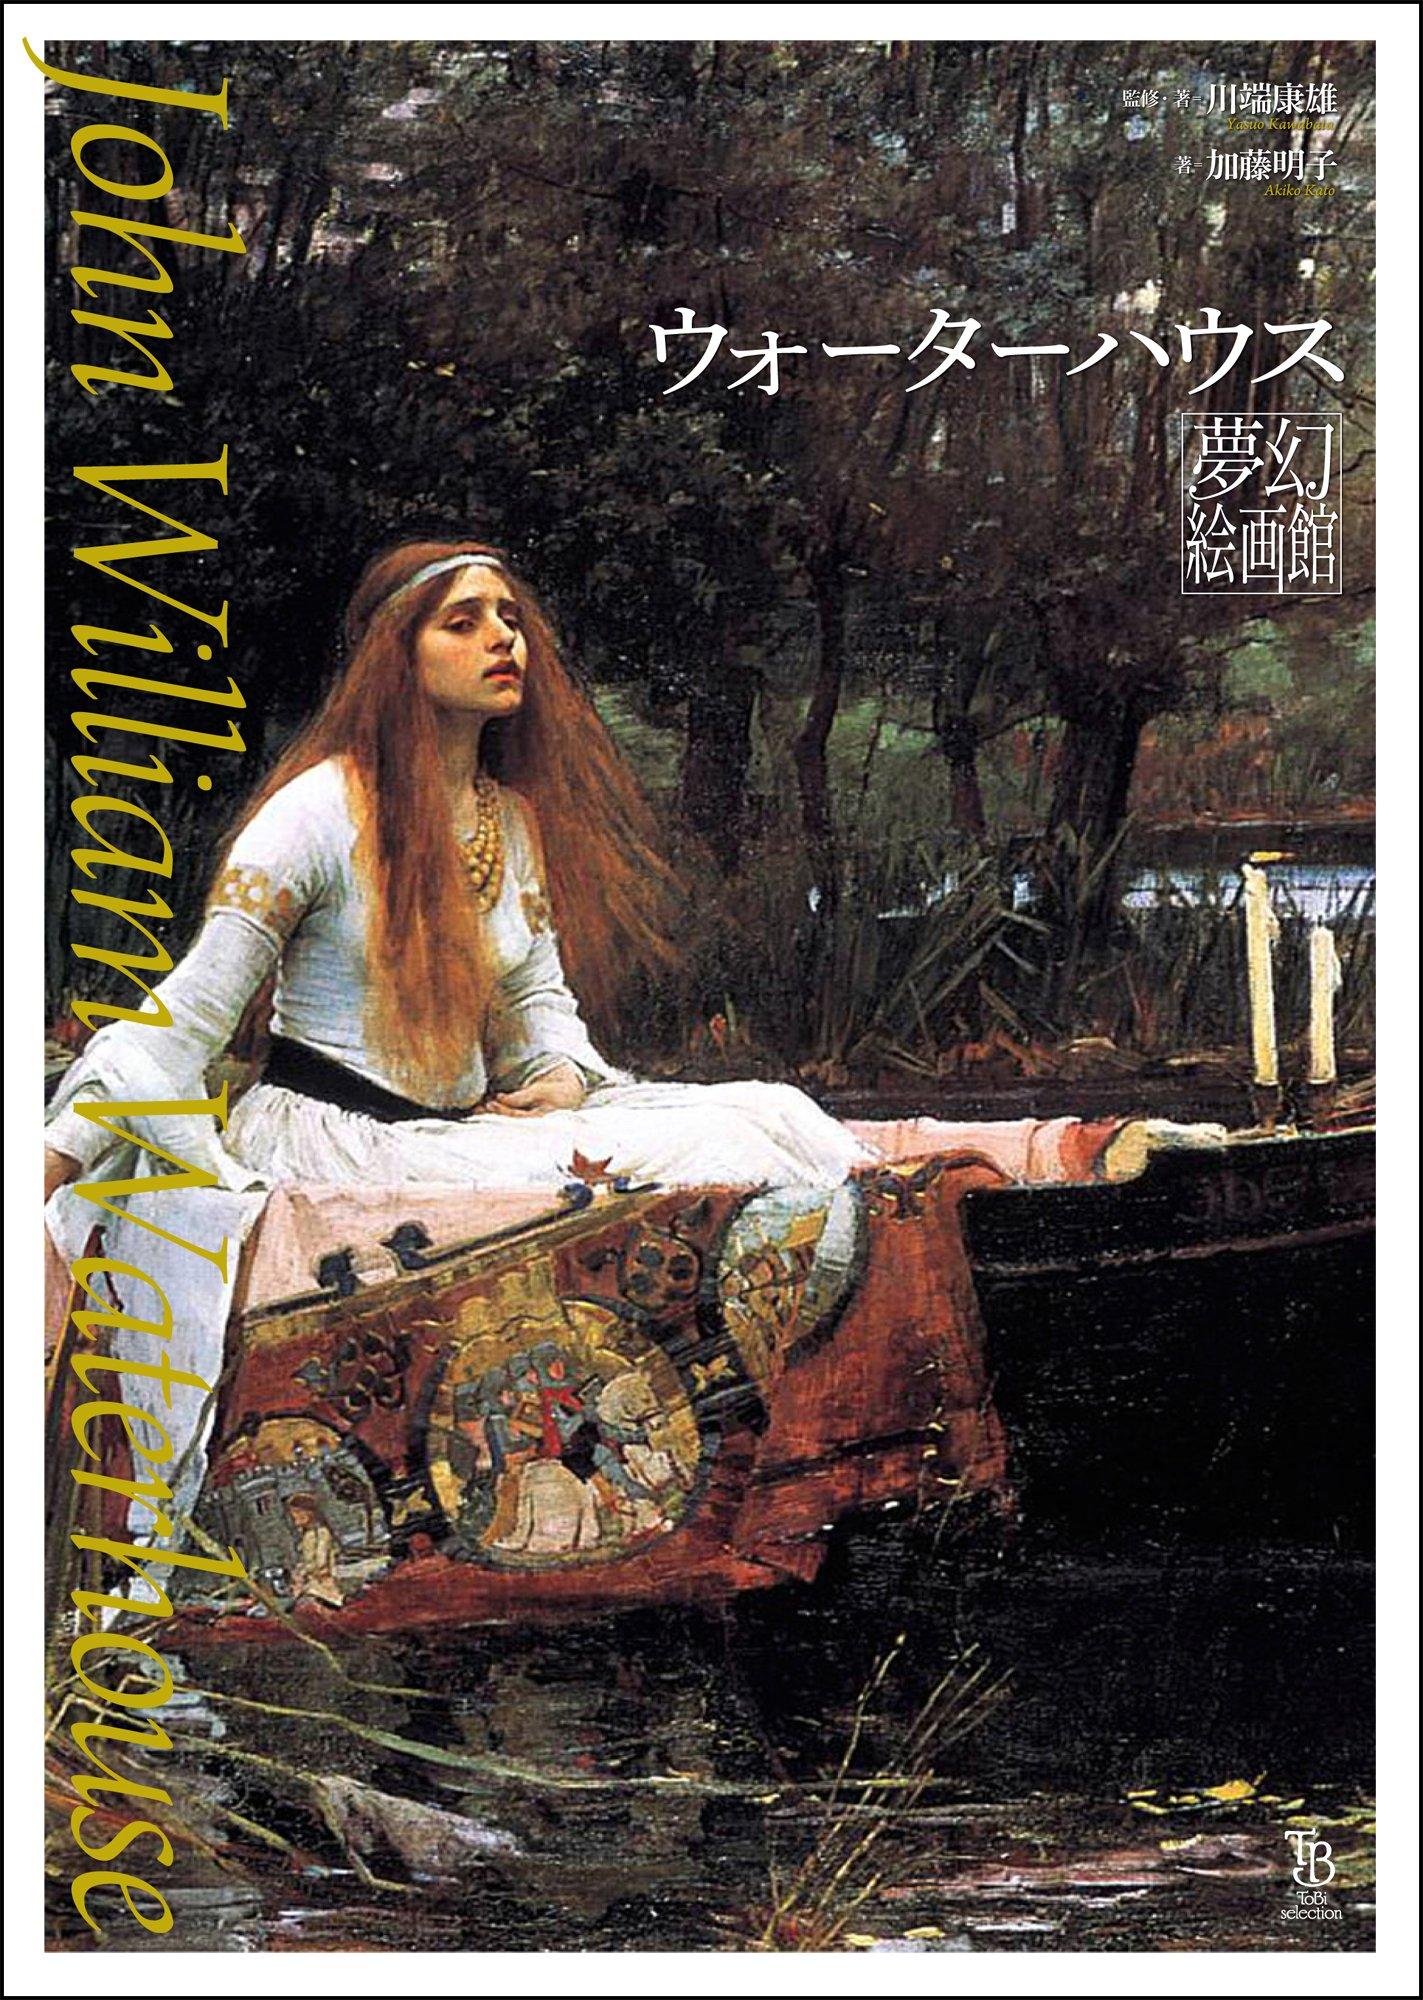 Amazon.co.jp: ウォーターハウス夢幻絵画館 (ToBi selection): 川端 ...